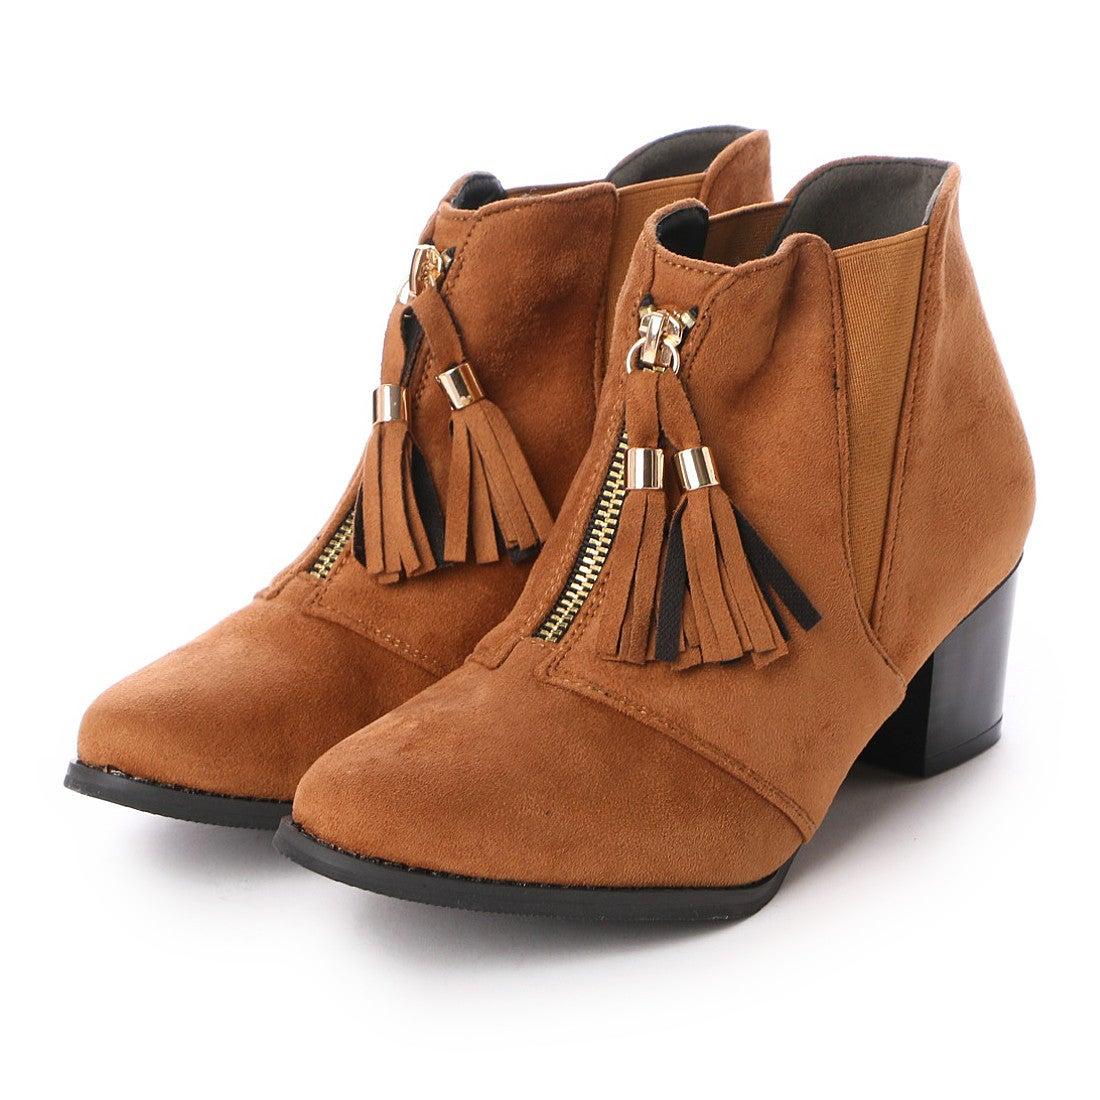 【SALE 52%OFF】ヌーベルヴォーグ リラックス NOUBEL VOUG Relax タッセル フリンジ サイドゴア ブーティー ショート ブーツ (キャメルスエード) レディース